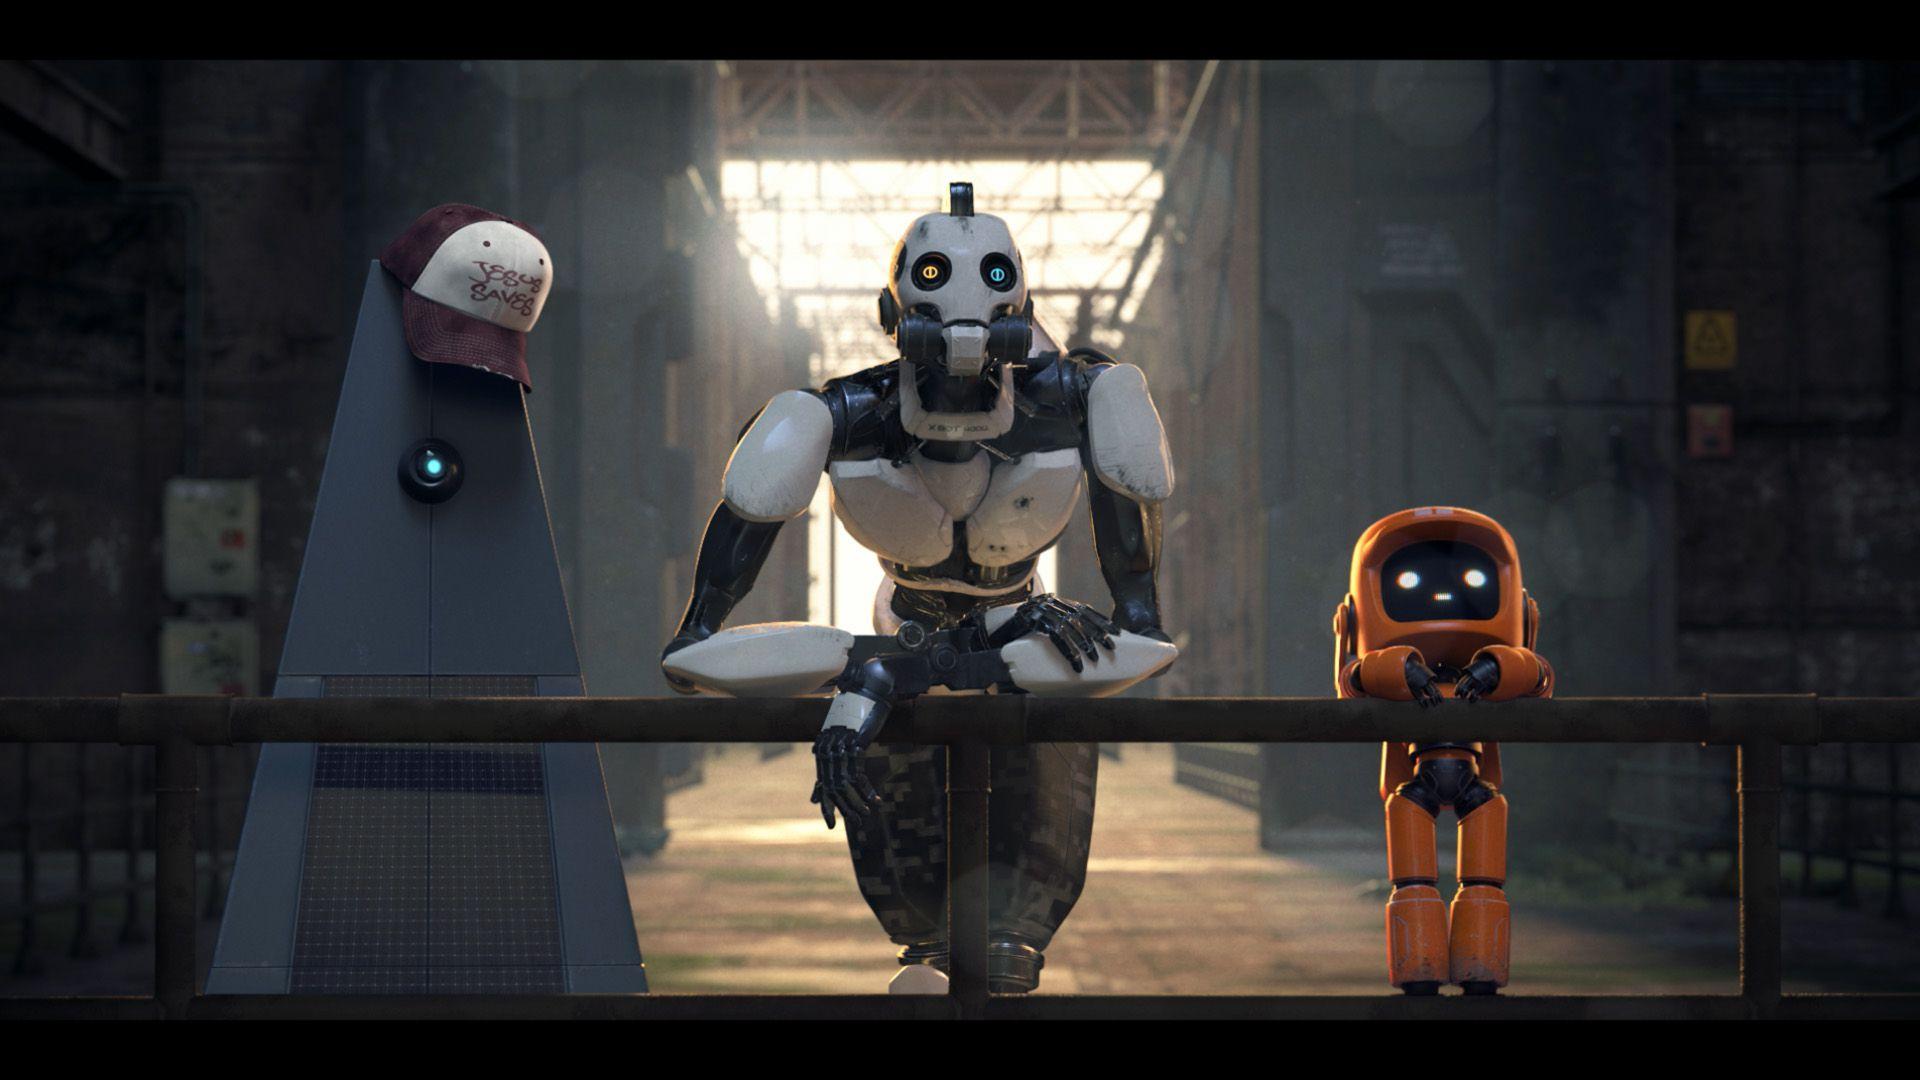 love-death-robots-three robots